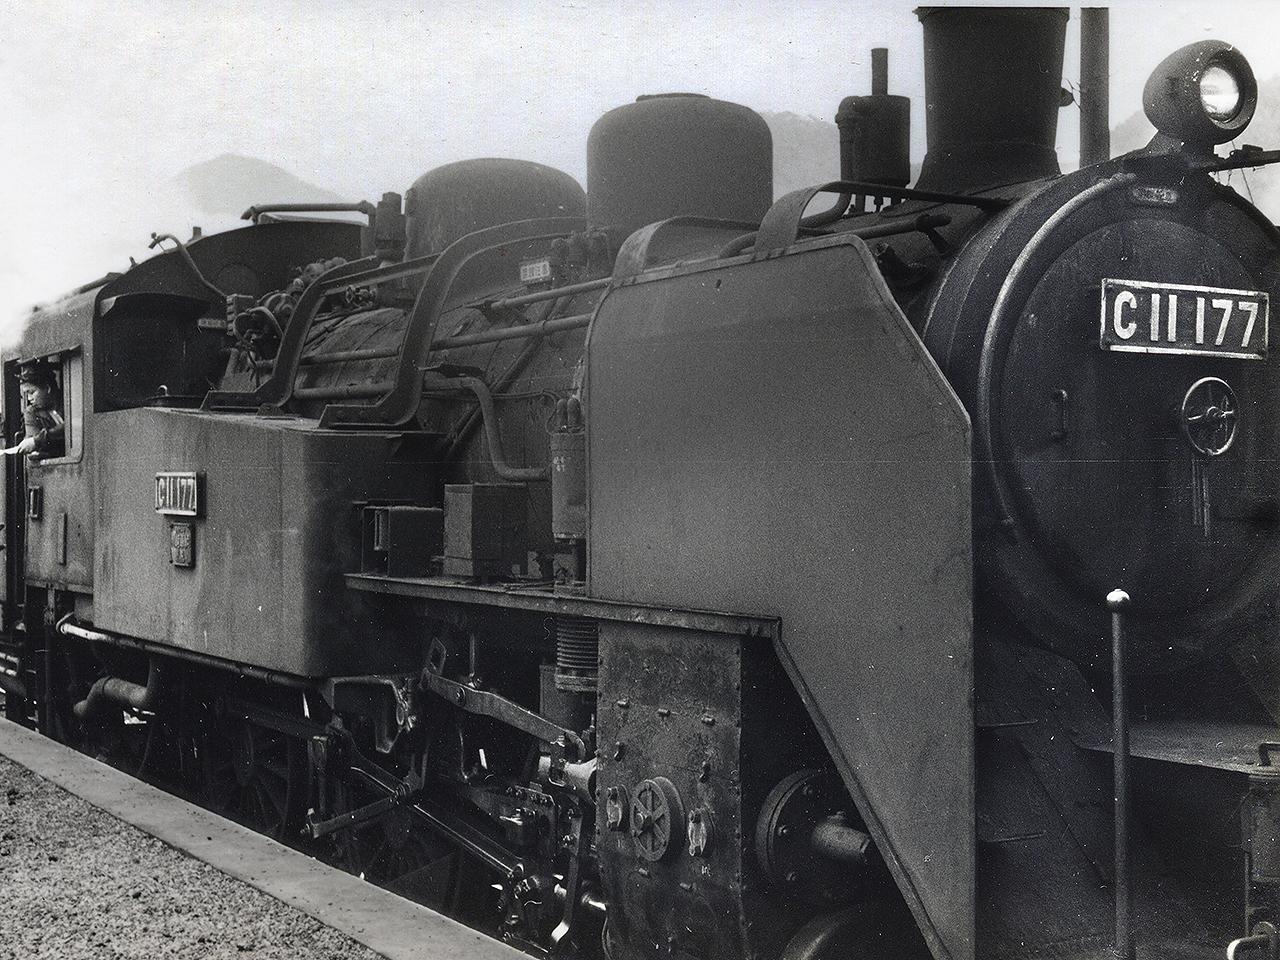 http://moritetsu.info/model-railway/img/w03_C11_003sssss.jpg